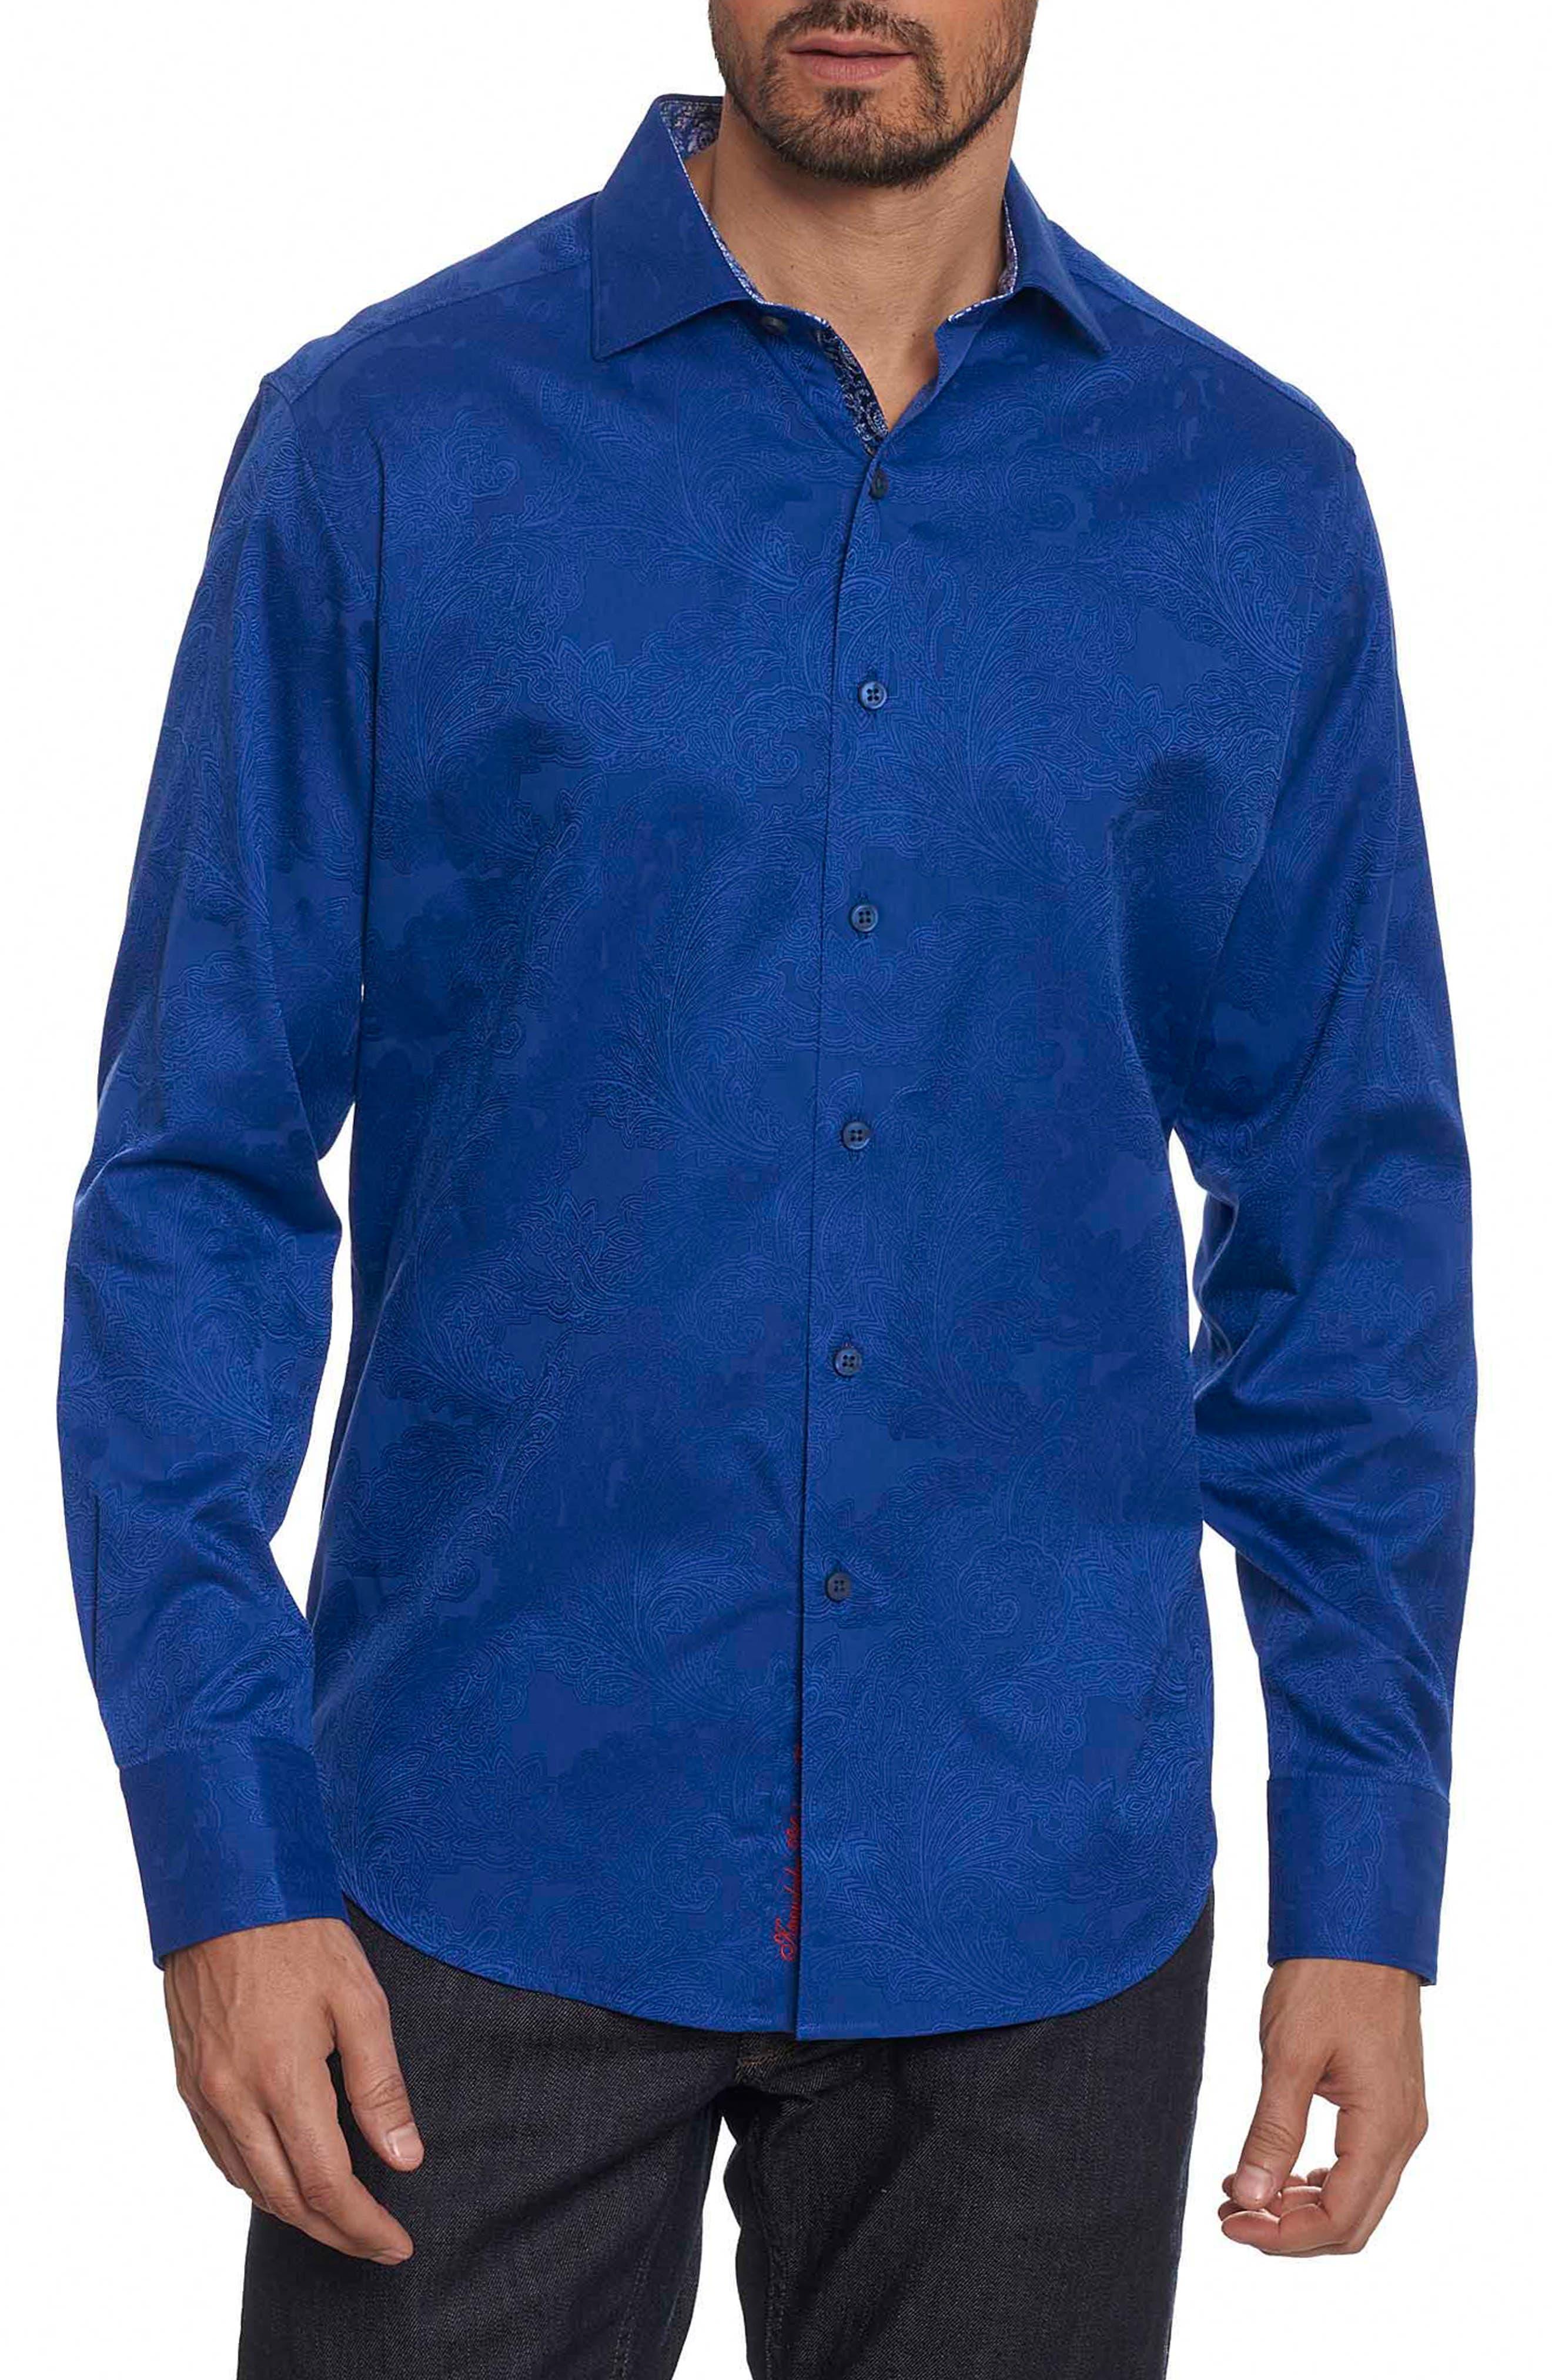 Rosendale Classic Fit Jacquard Sport Shirt,                         Main,                         color, 432